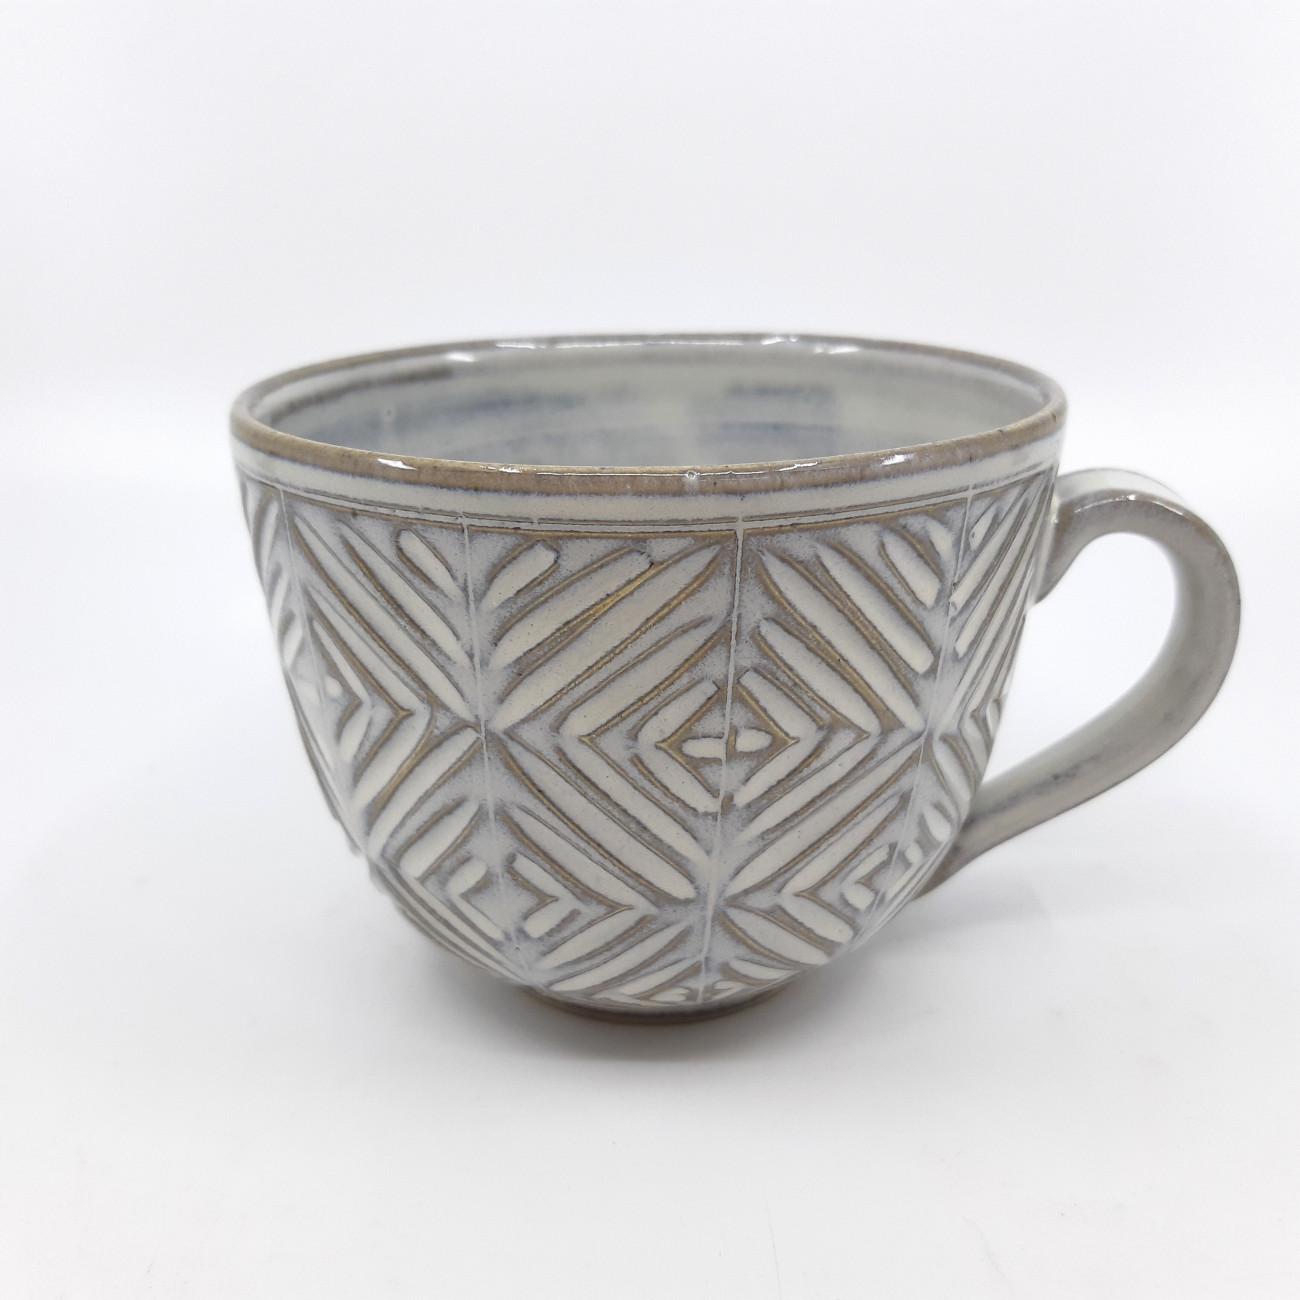 6227de8709   keramika sa mení na jananovo   - jananovo   SAShE.sk